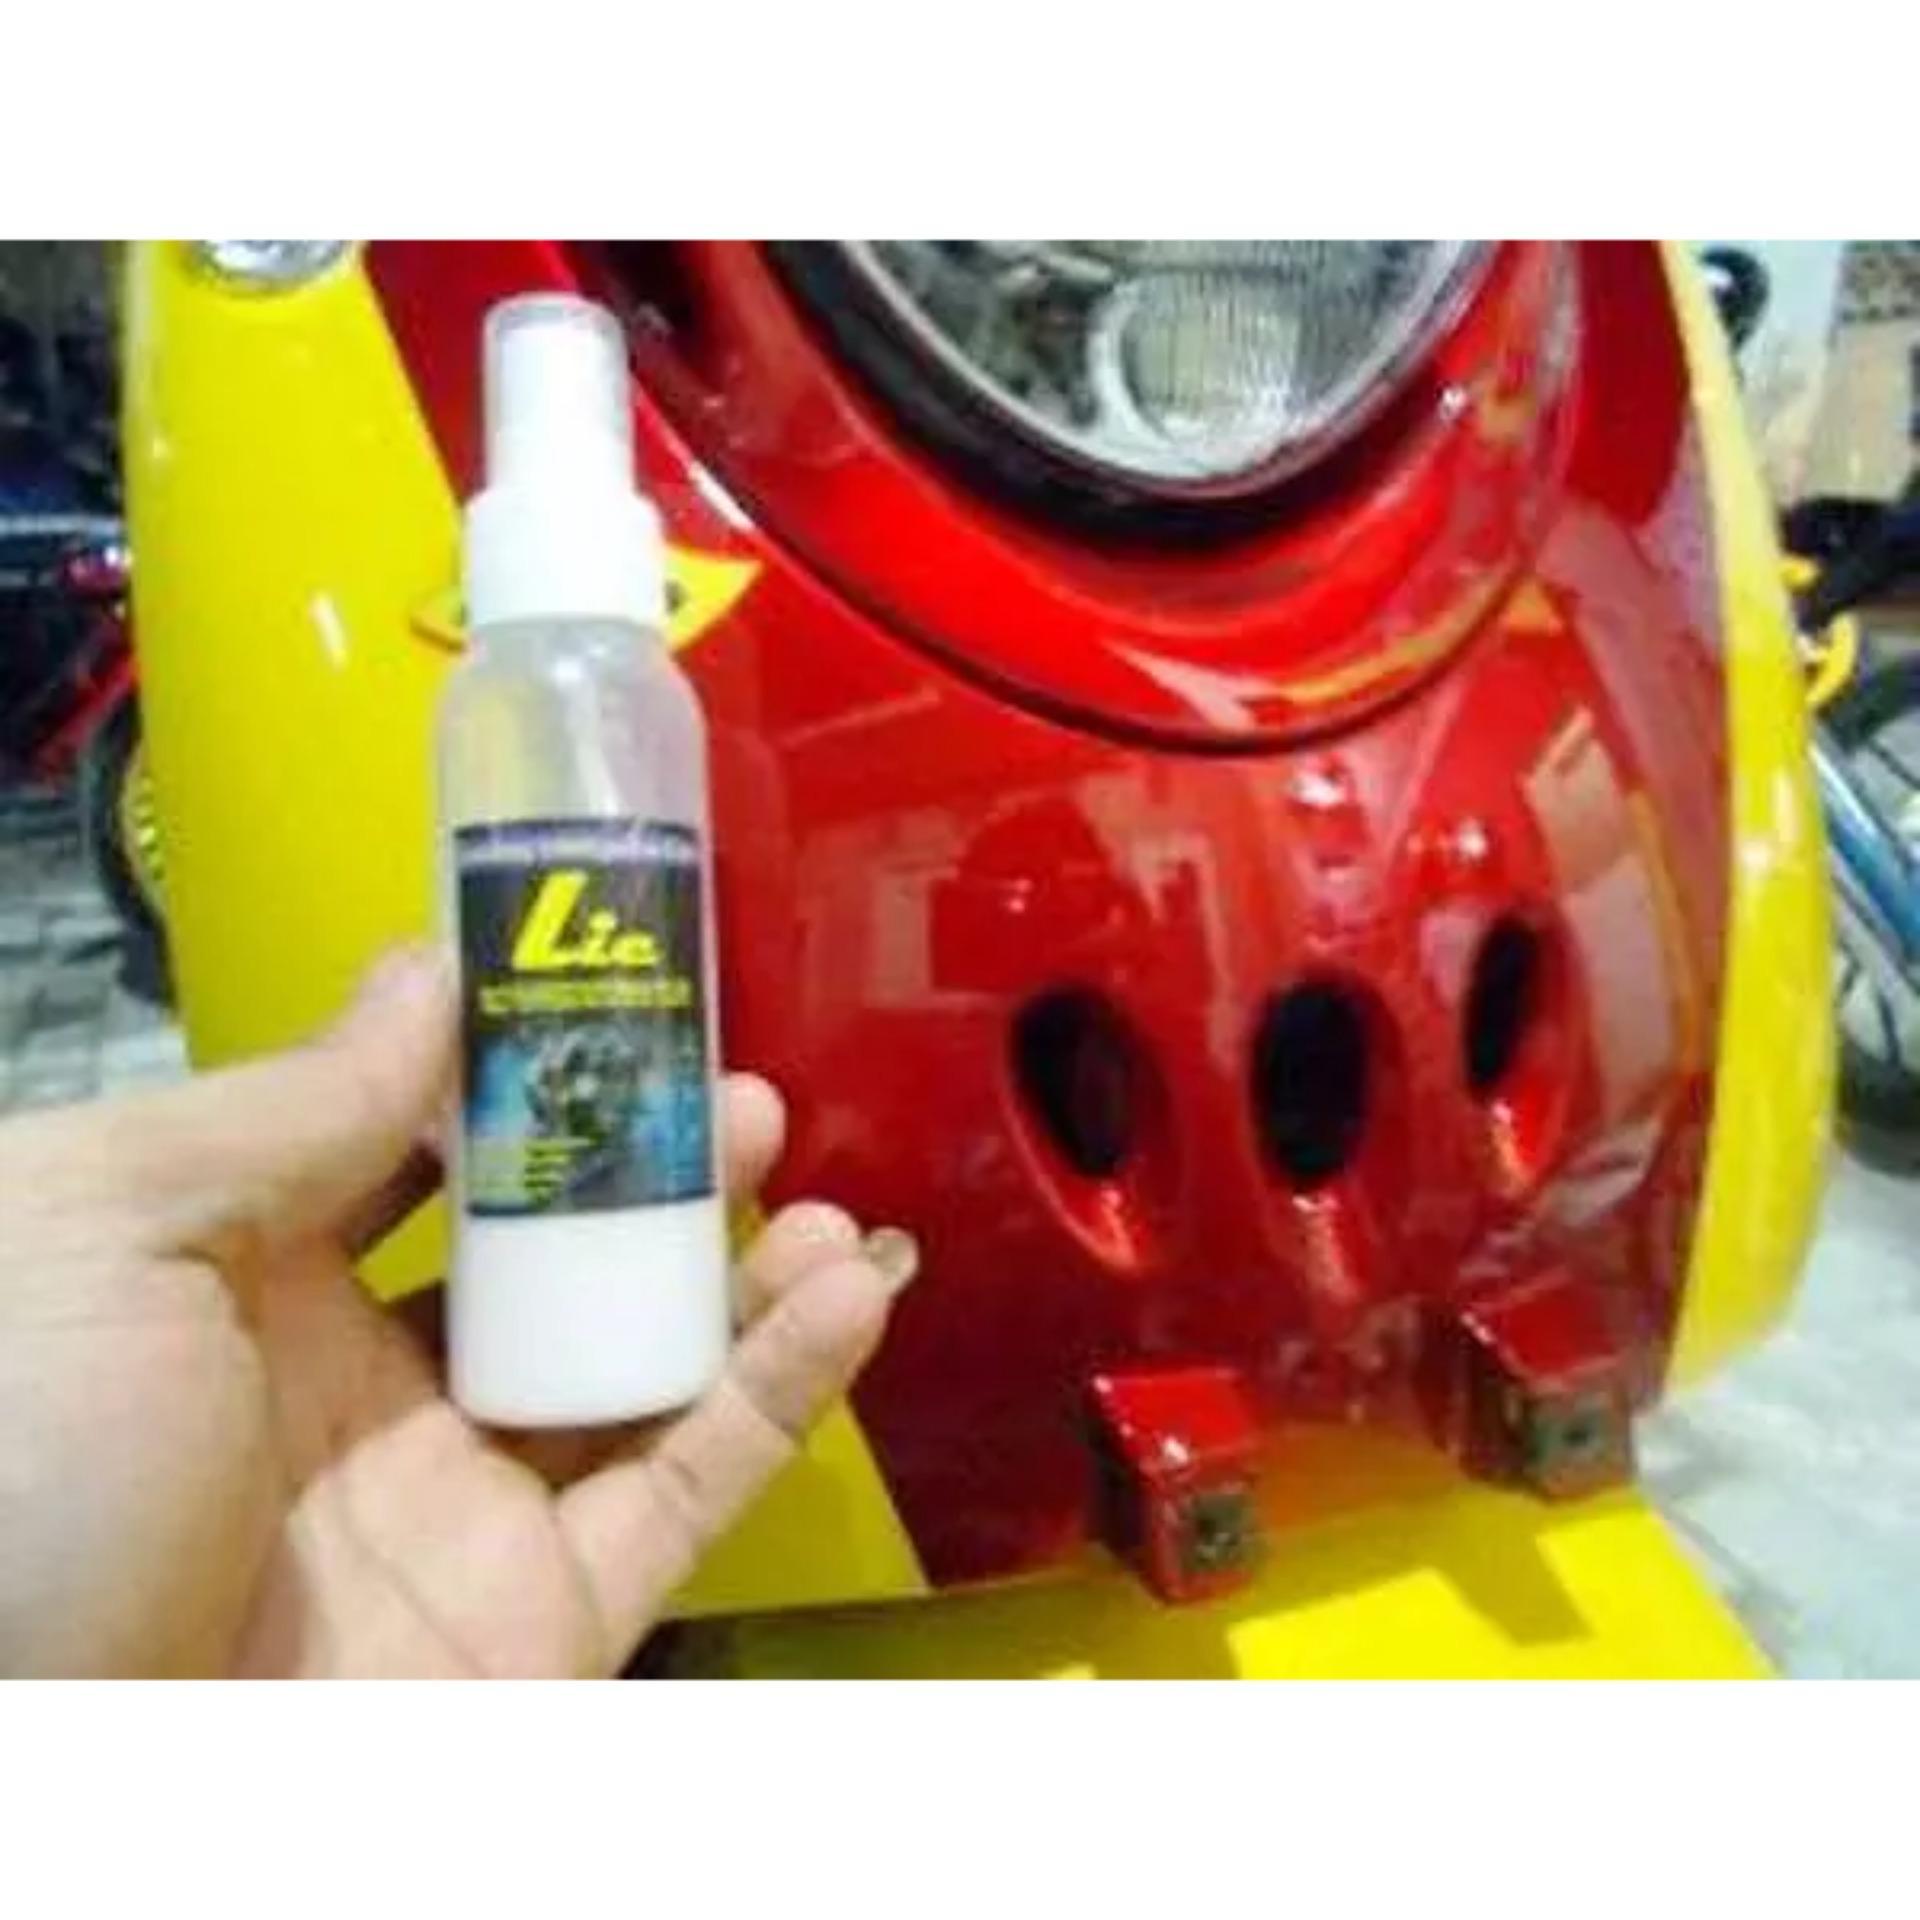 Sabusa Quick Wax Protection Obat Poles Mobil Motor Helm Sepeda 3m Moto Pn11414 Body Protects Paint Instant Glow Lic Triple Action Polish Visor 110ml